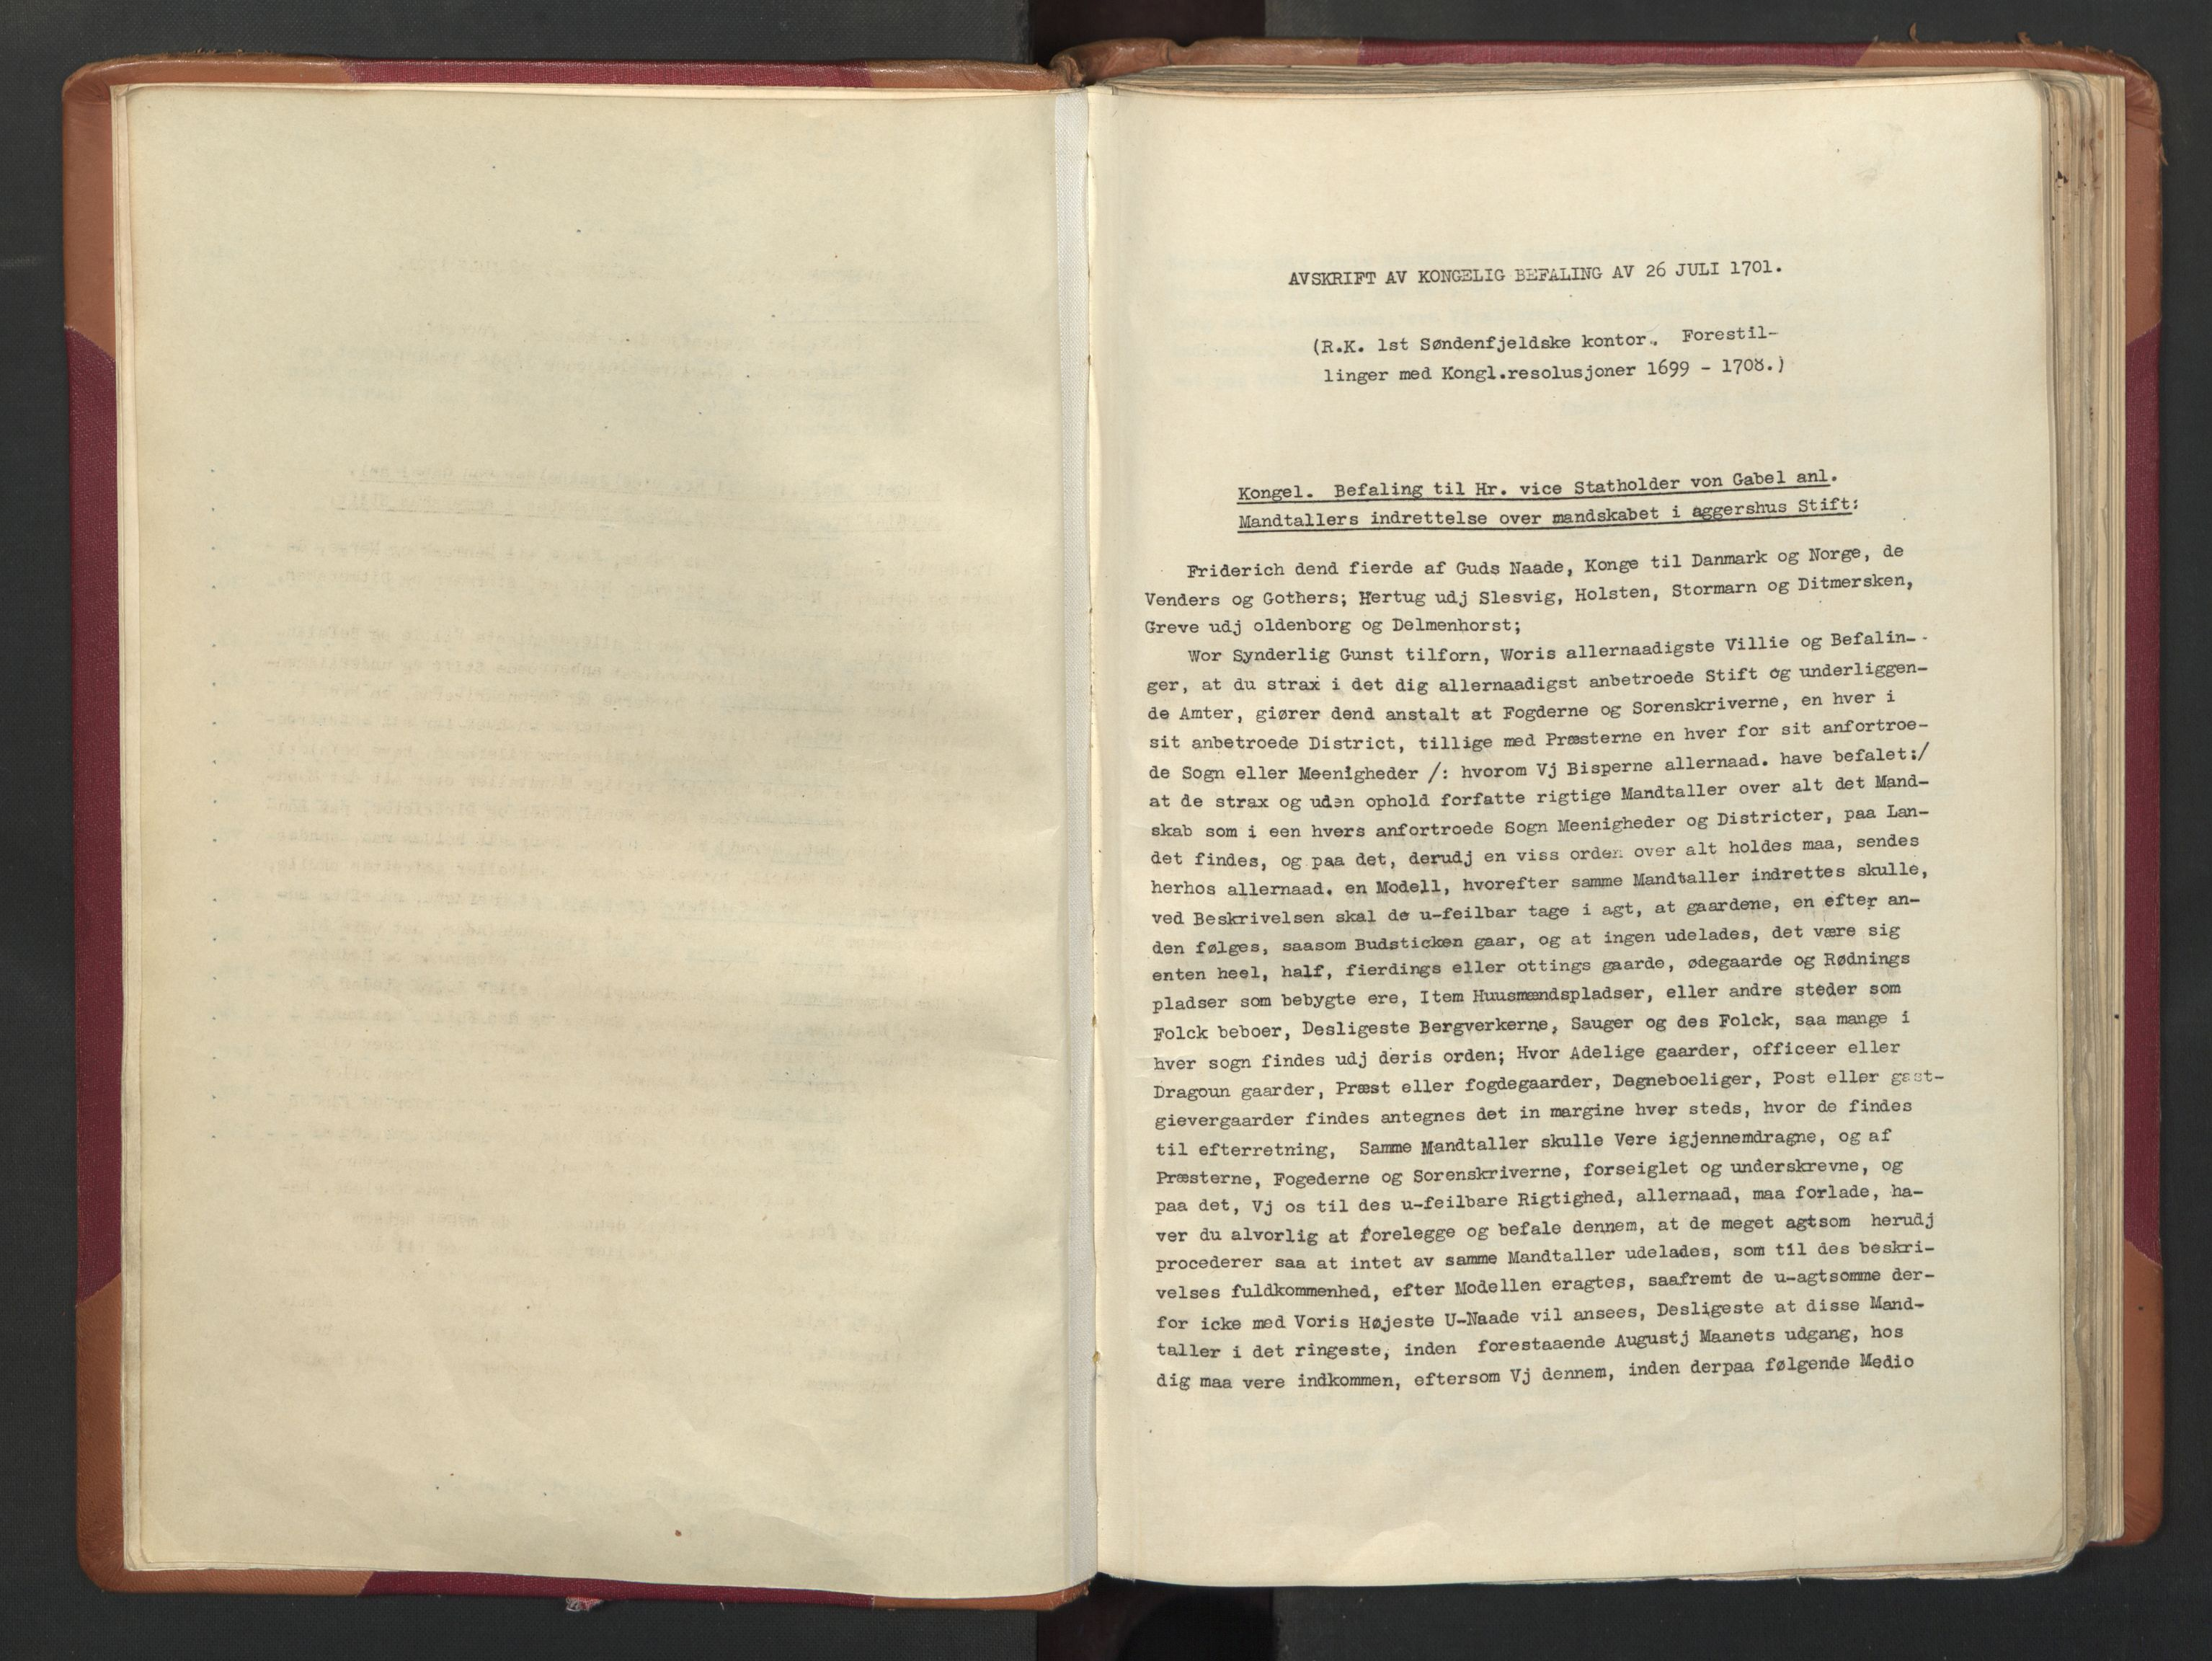 RA, Manntallet 1701, nr. 16: Helgeland fogderi, 1701, s. upaginert